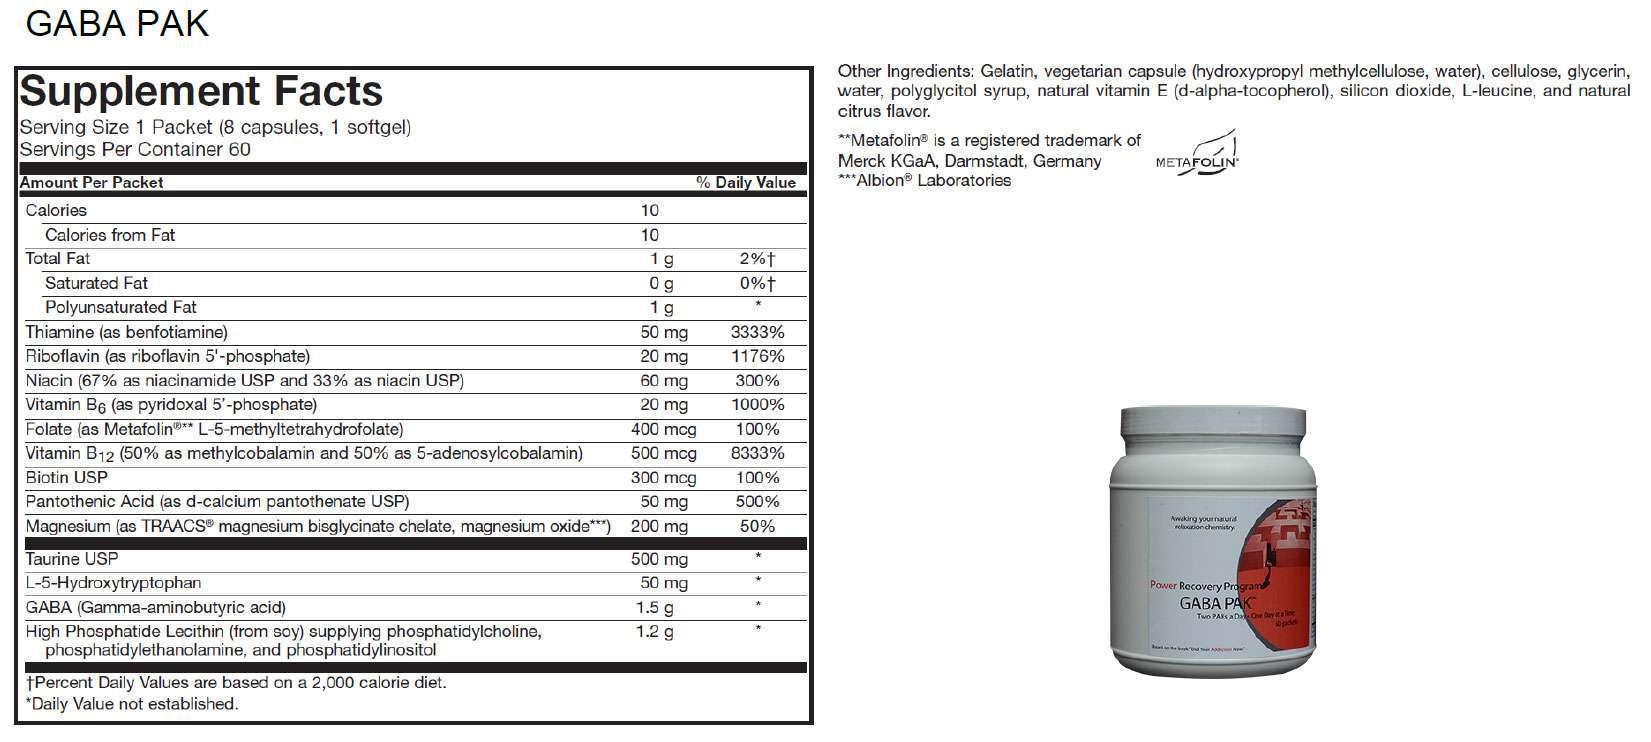 GABA-PAK-Supplement-Facts